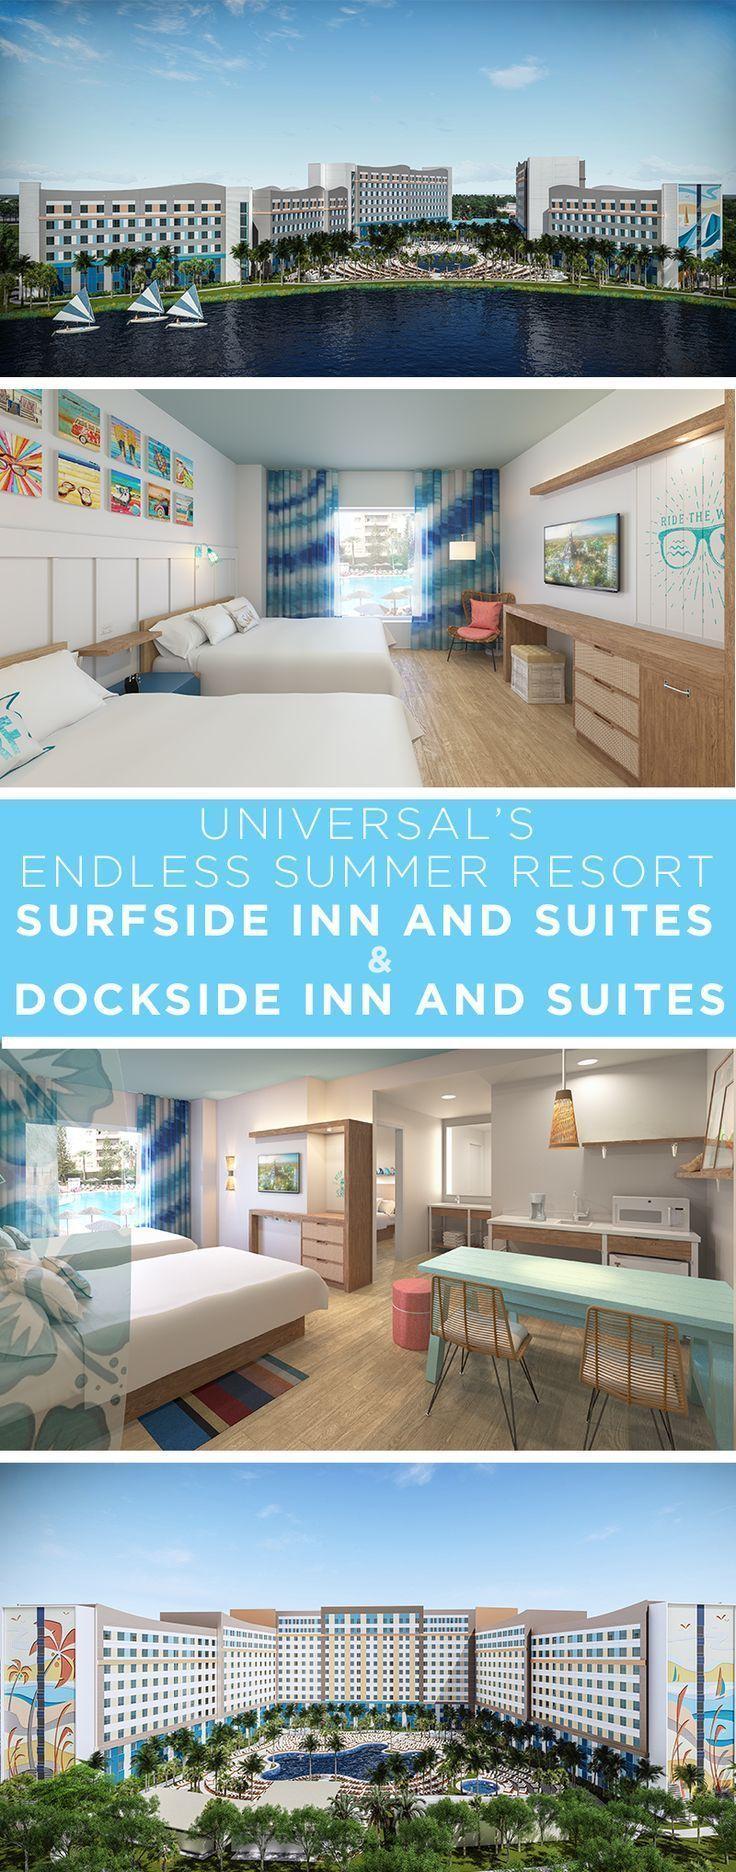 Introducing Universal's Endless Summer Resort Surfside